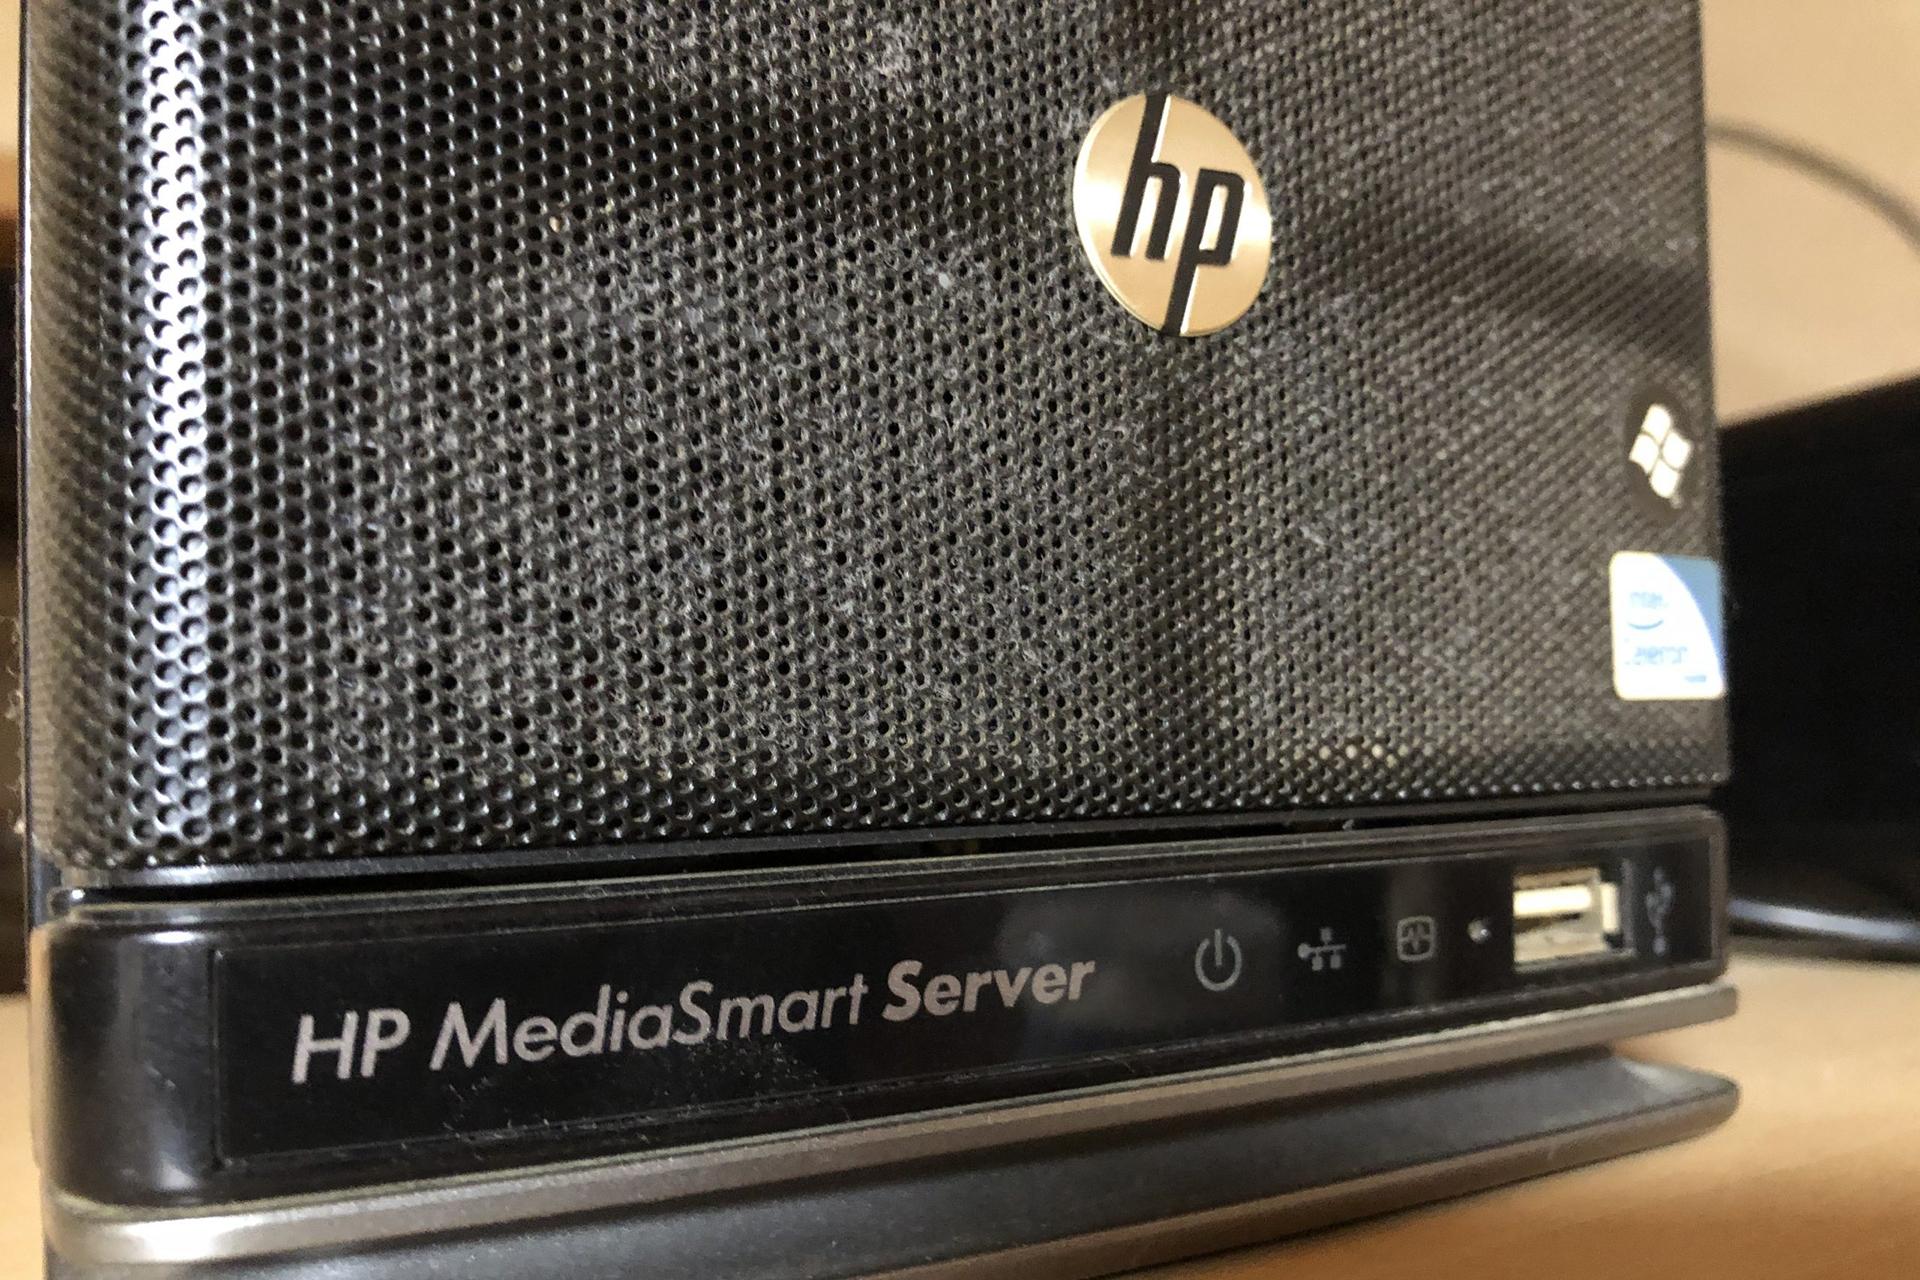 MediaSmart Server EX490